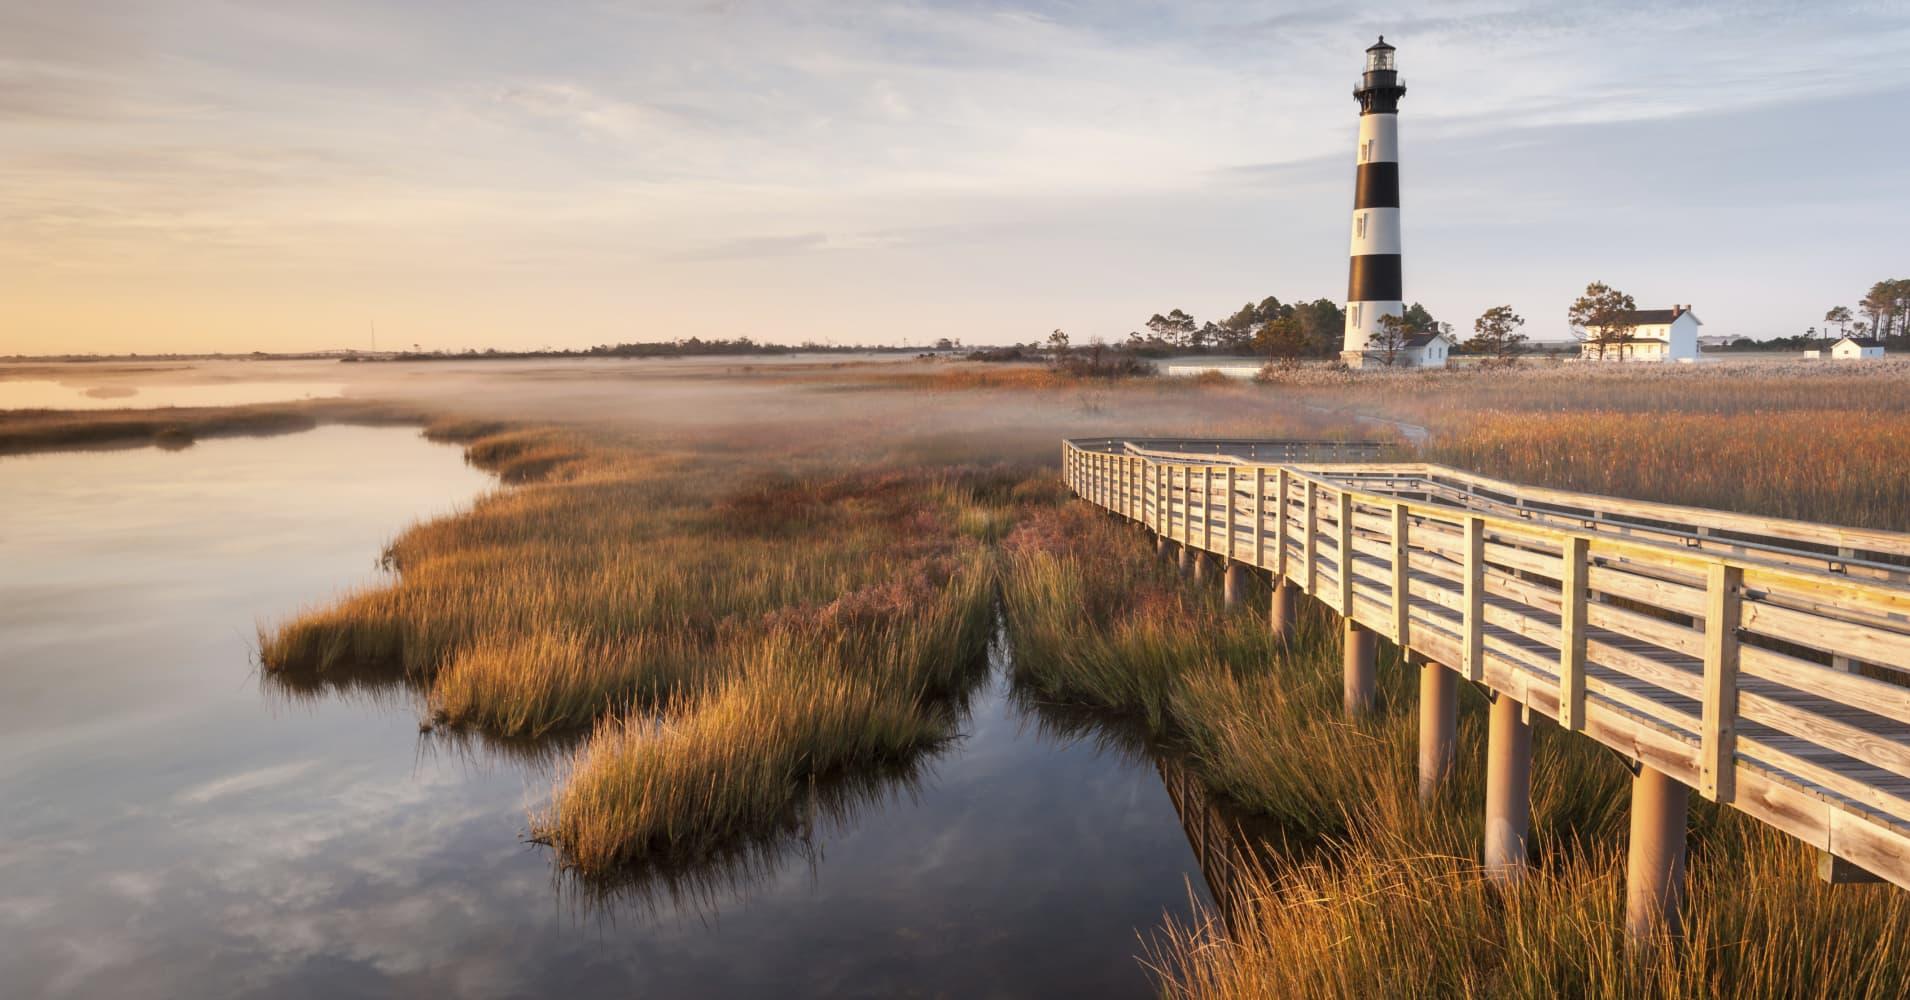 Bodie Island Lighthouse, Cape Hatteras National Seashore, North Carolina загрузить